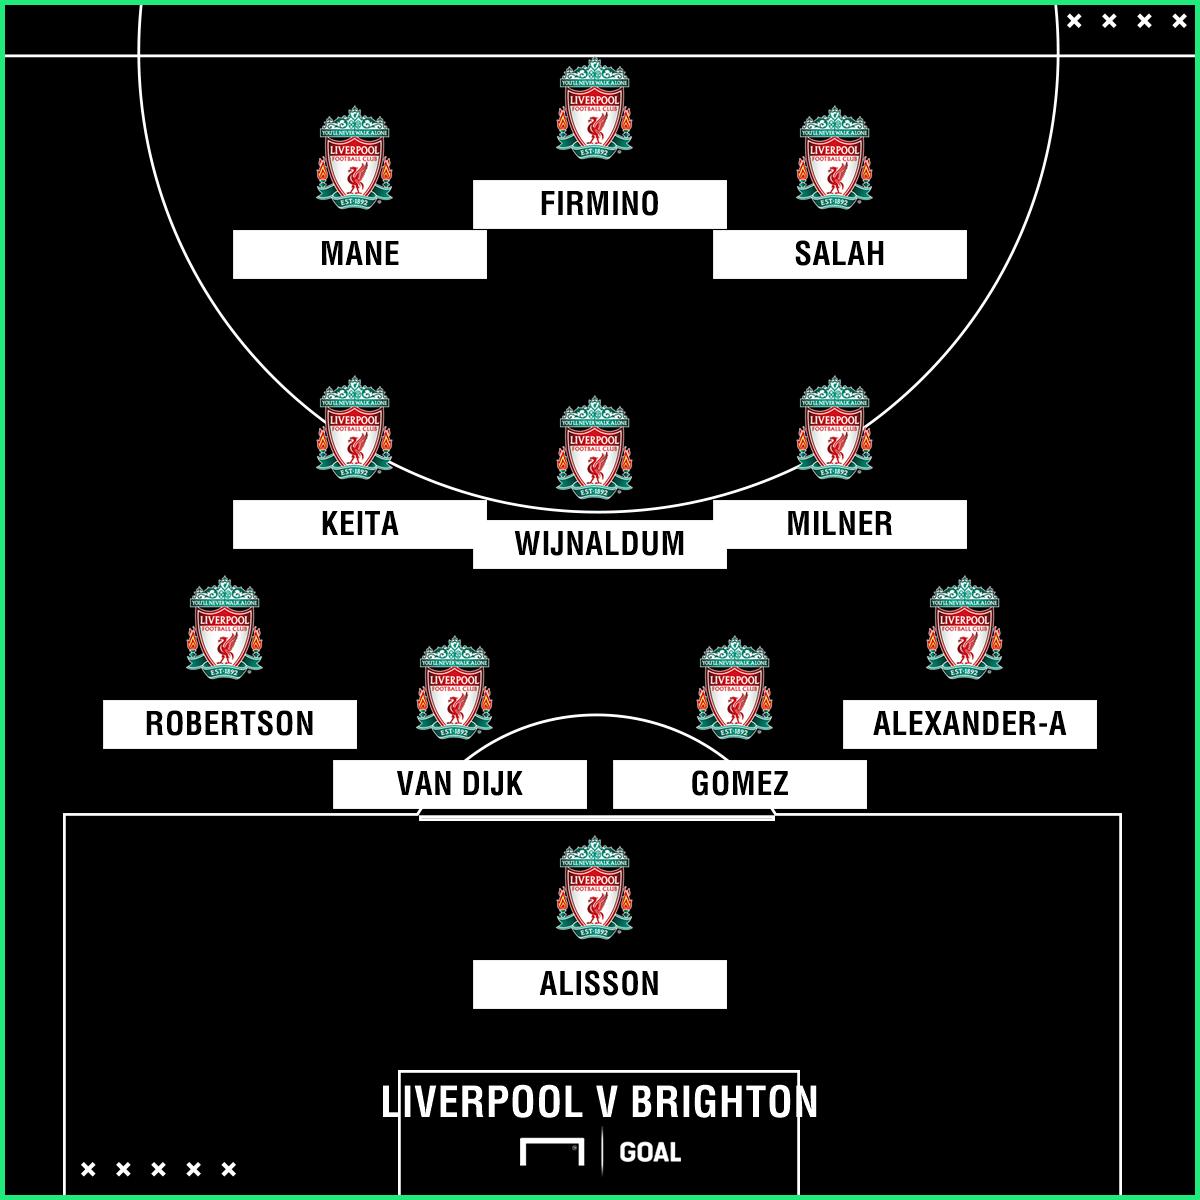 Likely Liverpool team v Brighton